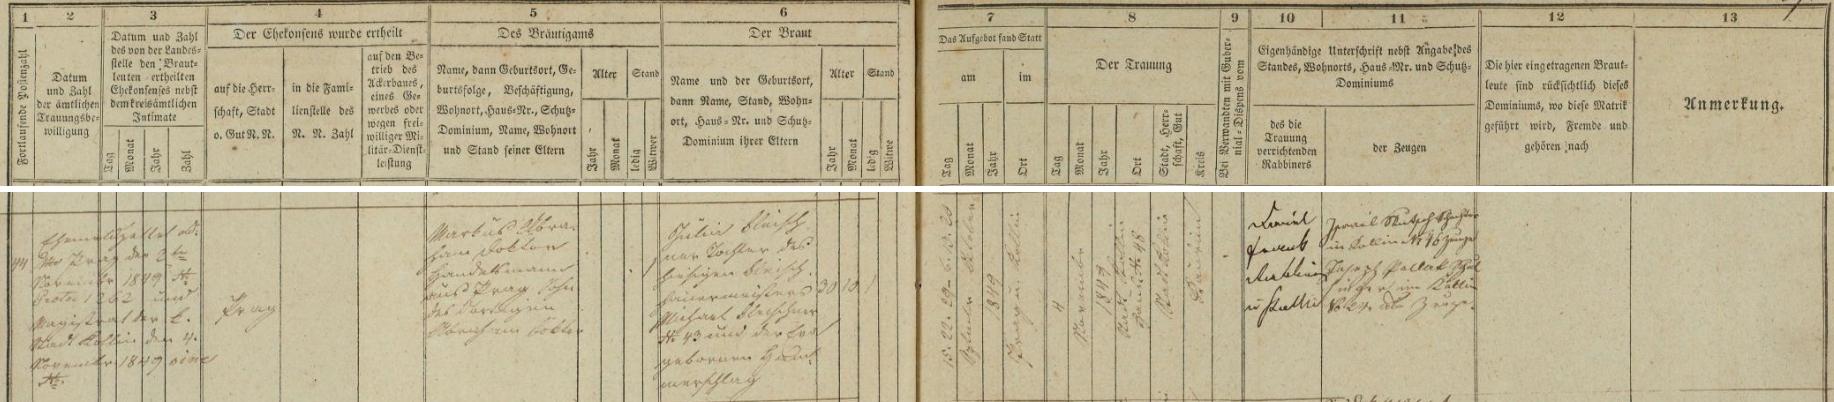 Záznam o svatbě jeho rodičů v kolínské židovské matrice